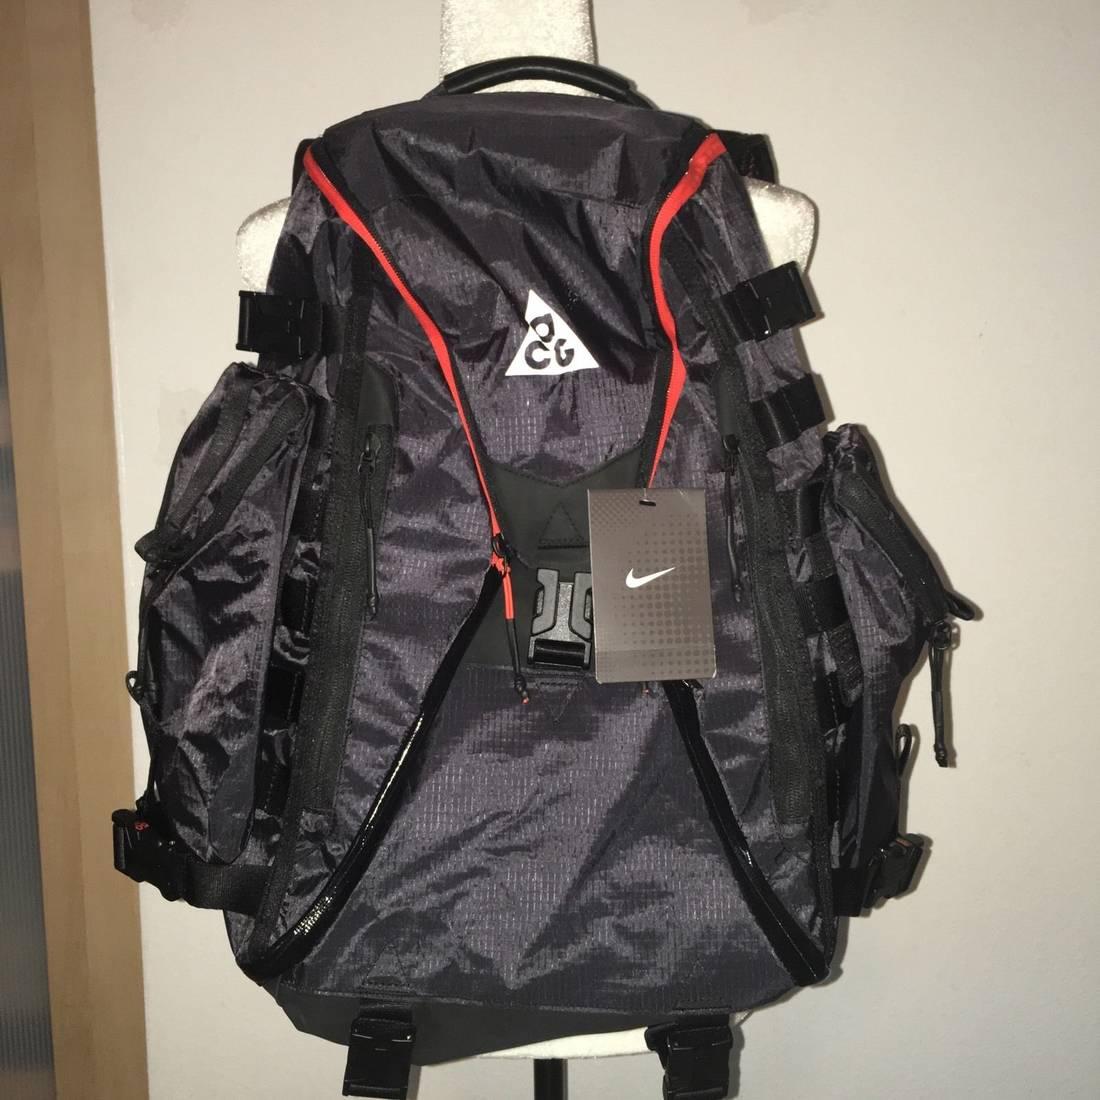 59ca229426d5 Acronym Nikelab ACG Responder Backpack Size ONE SIZE - 5 ...